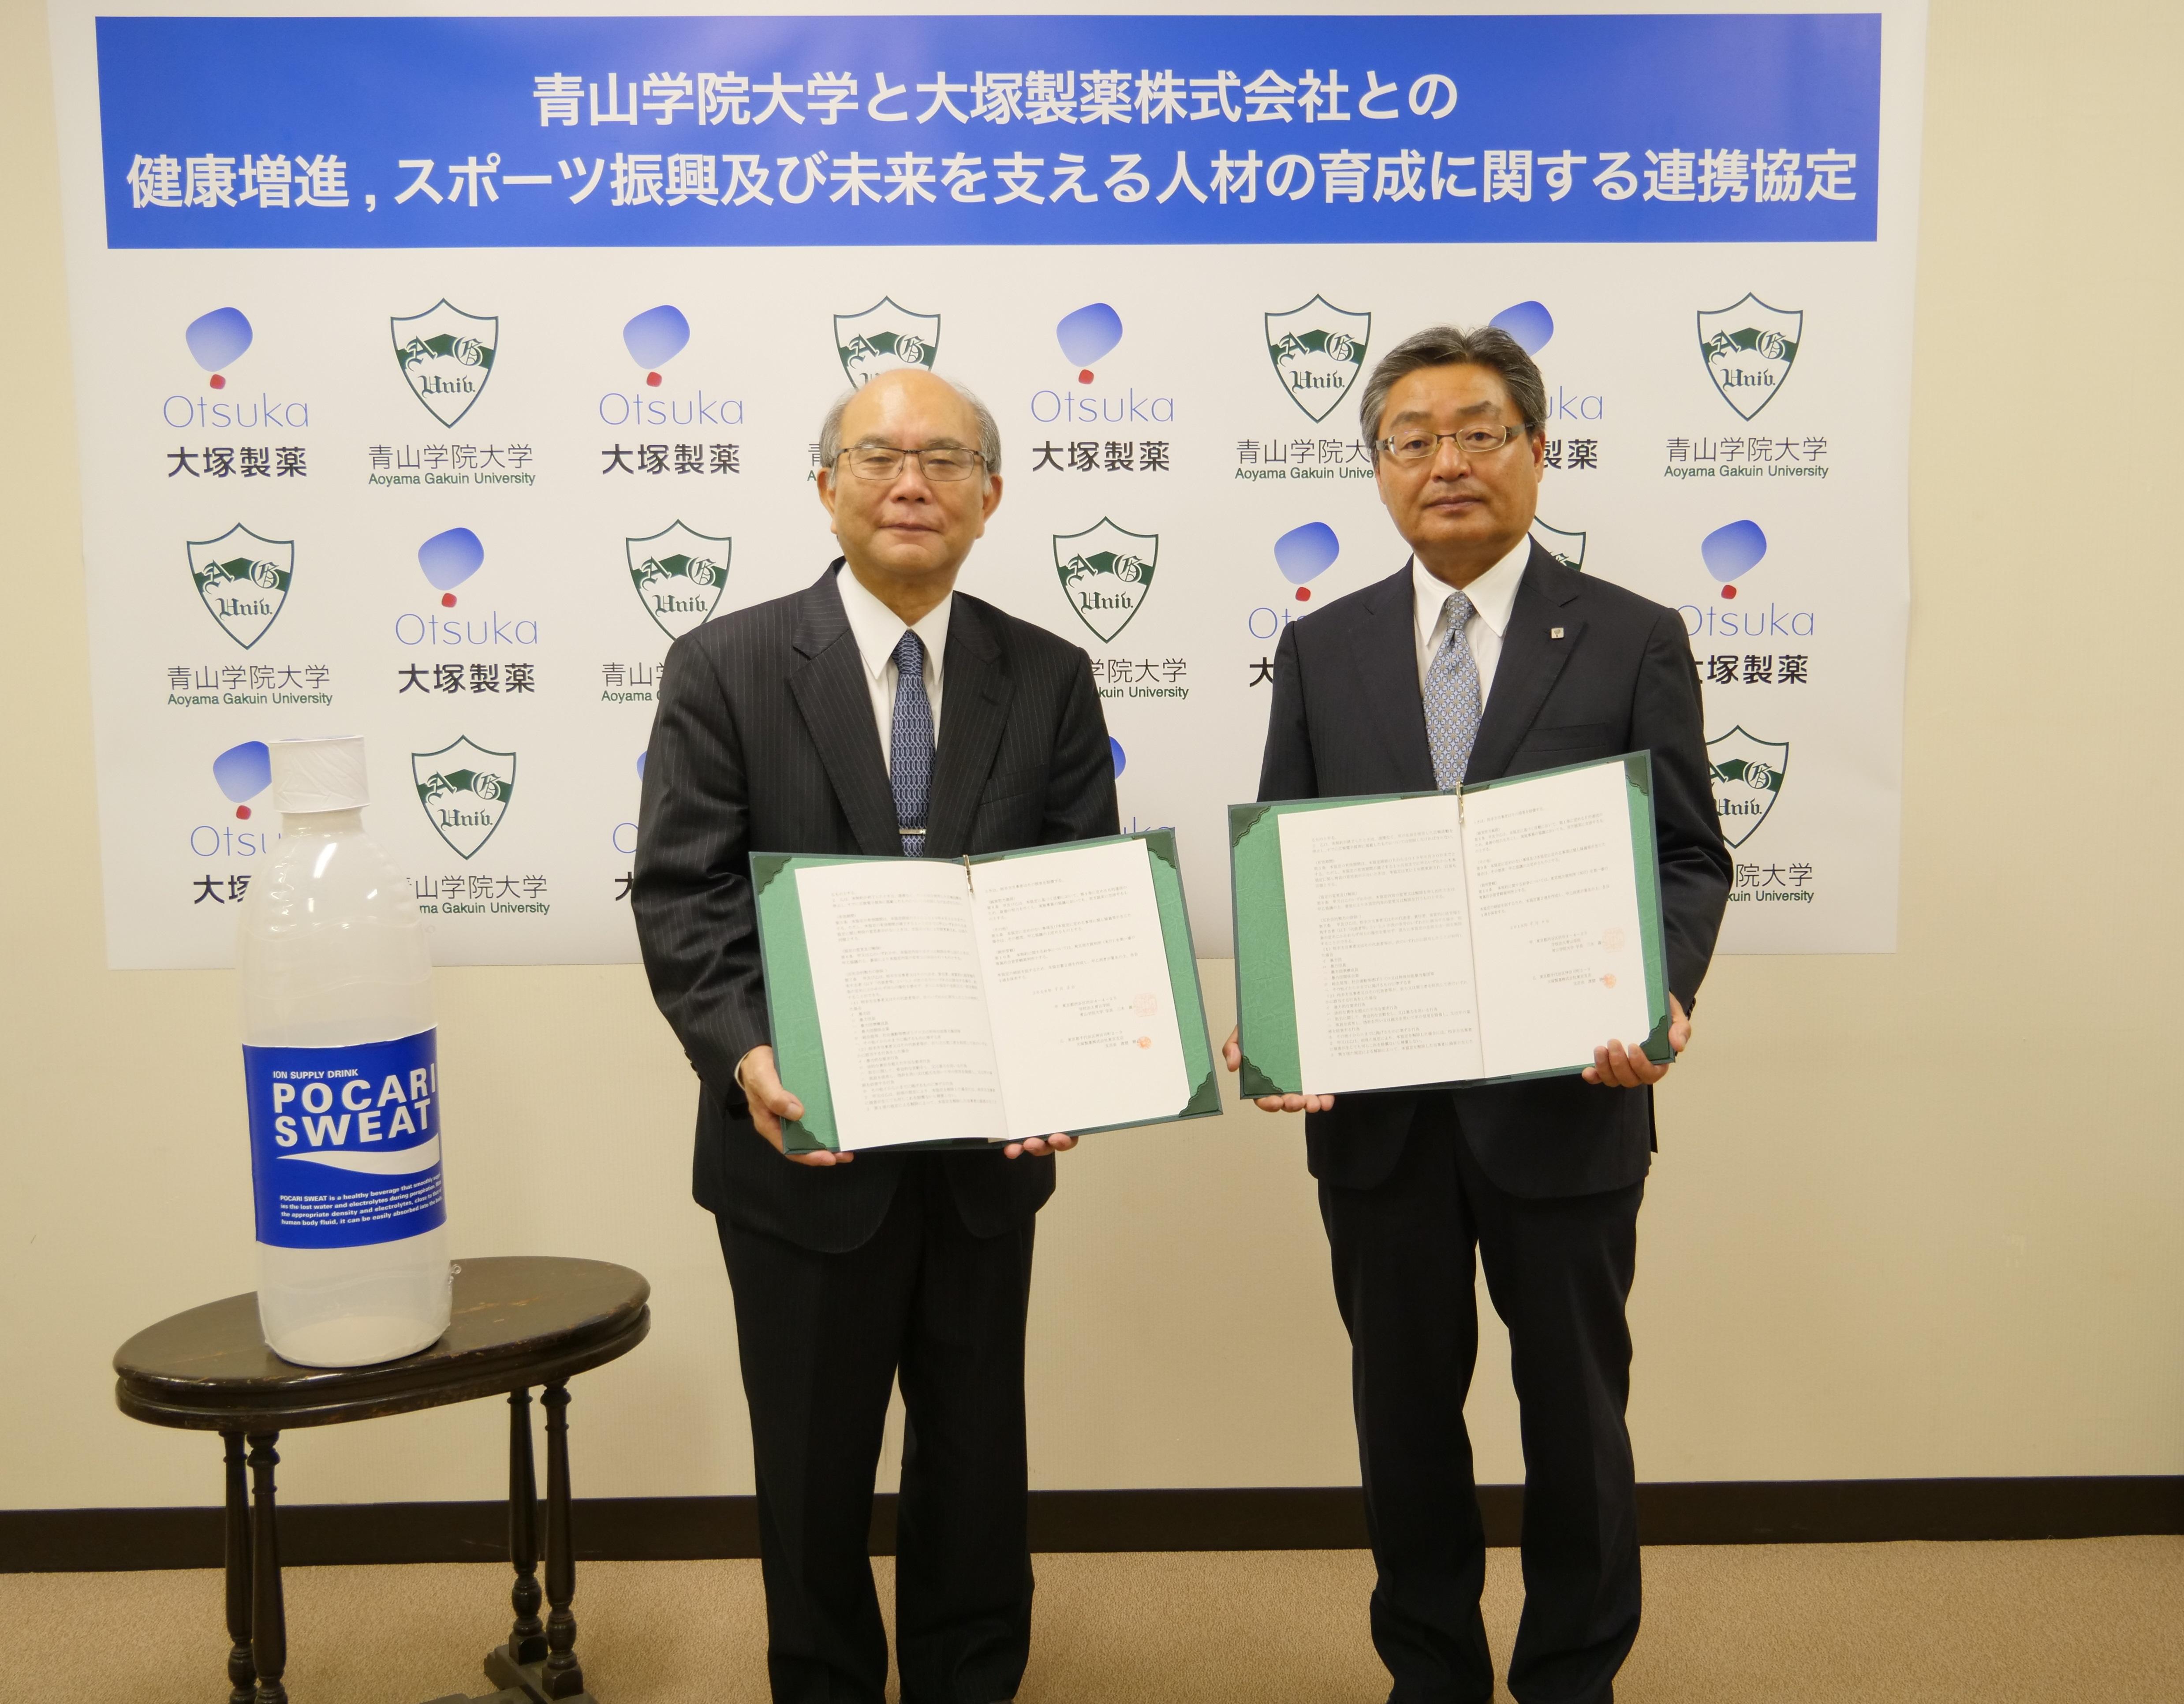 青山学院大学と大塚製薬株式会社が連携協定を締結